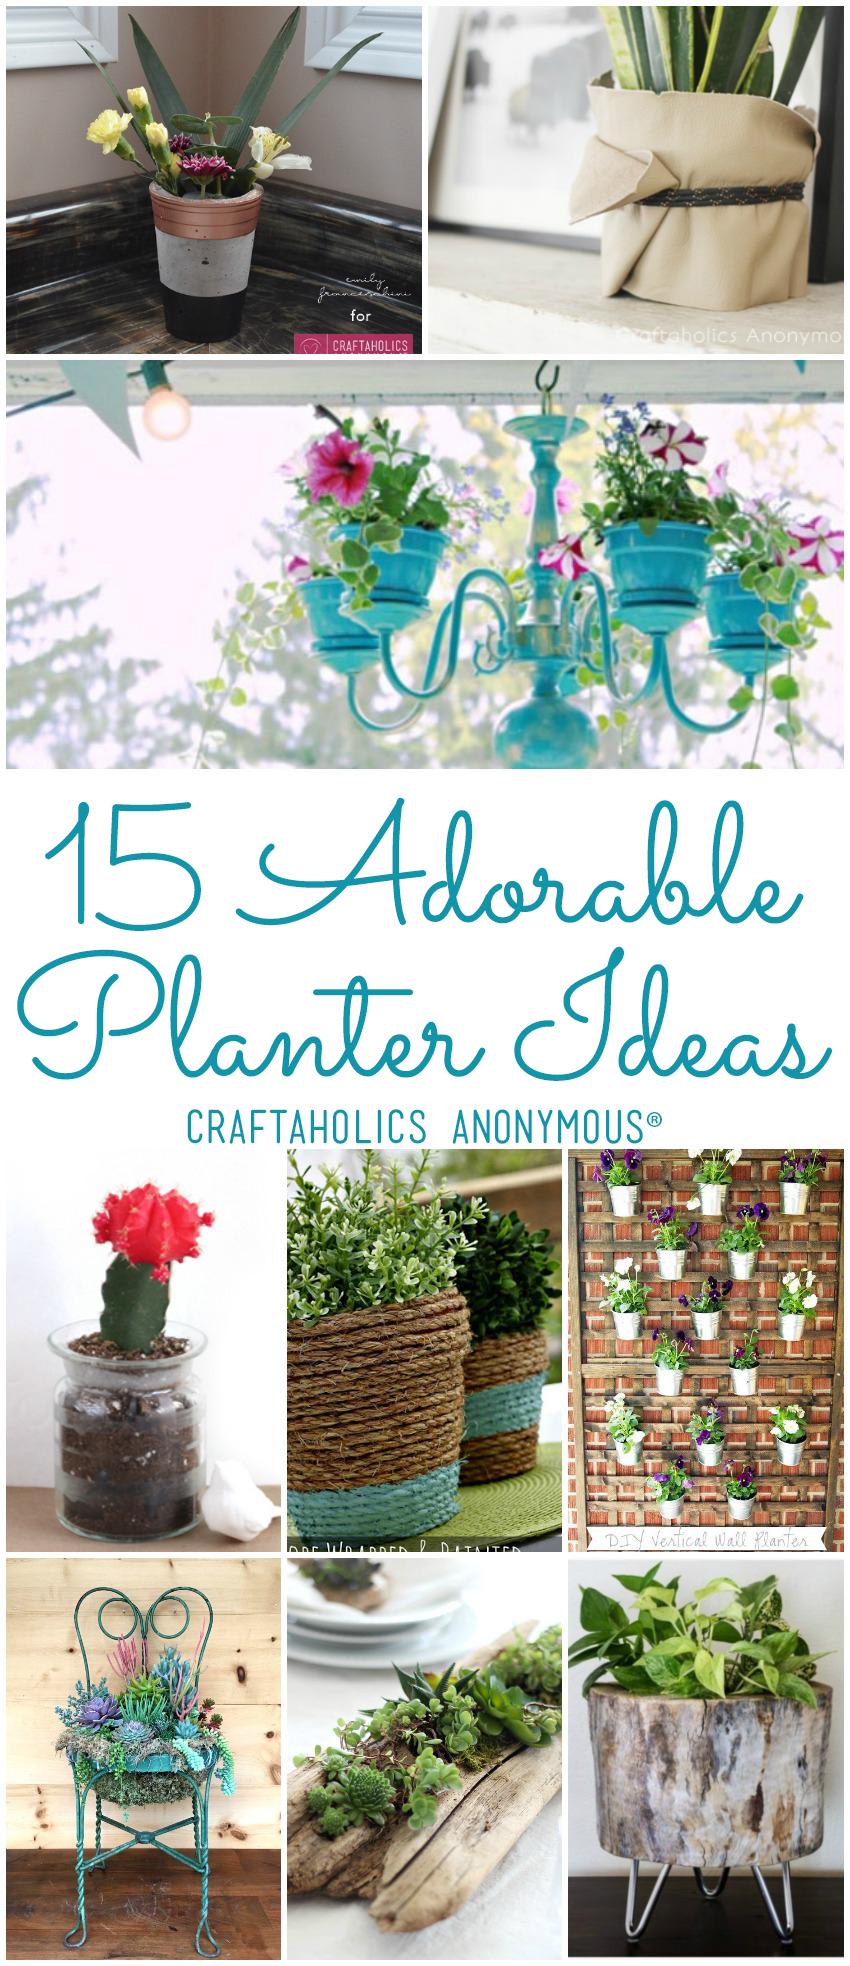 15 DIY Planter Ideas